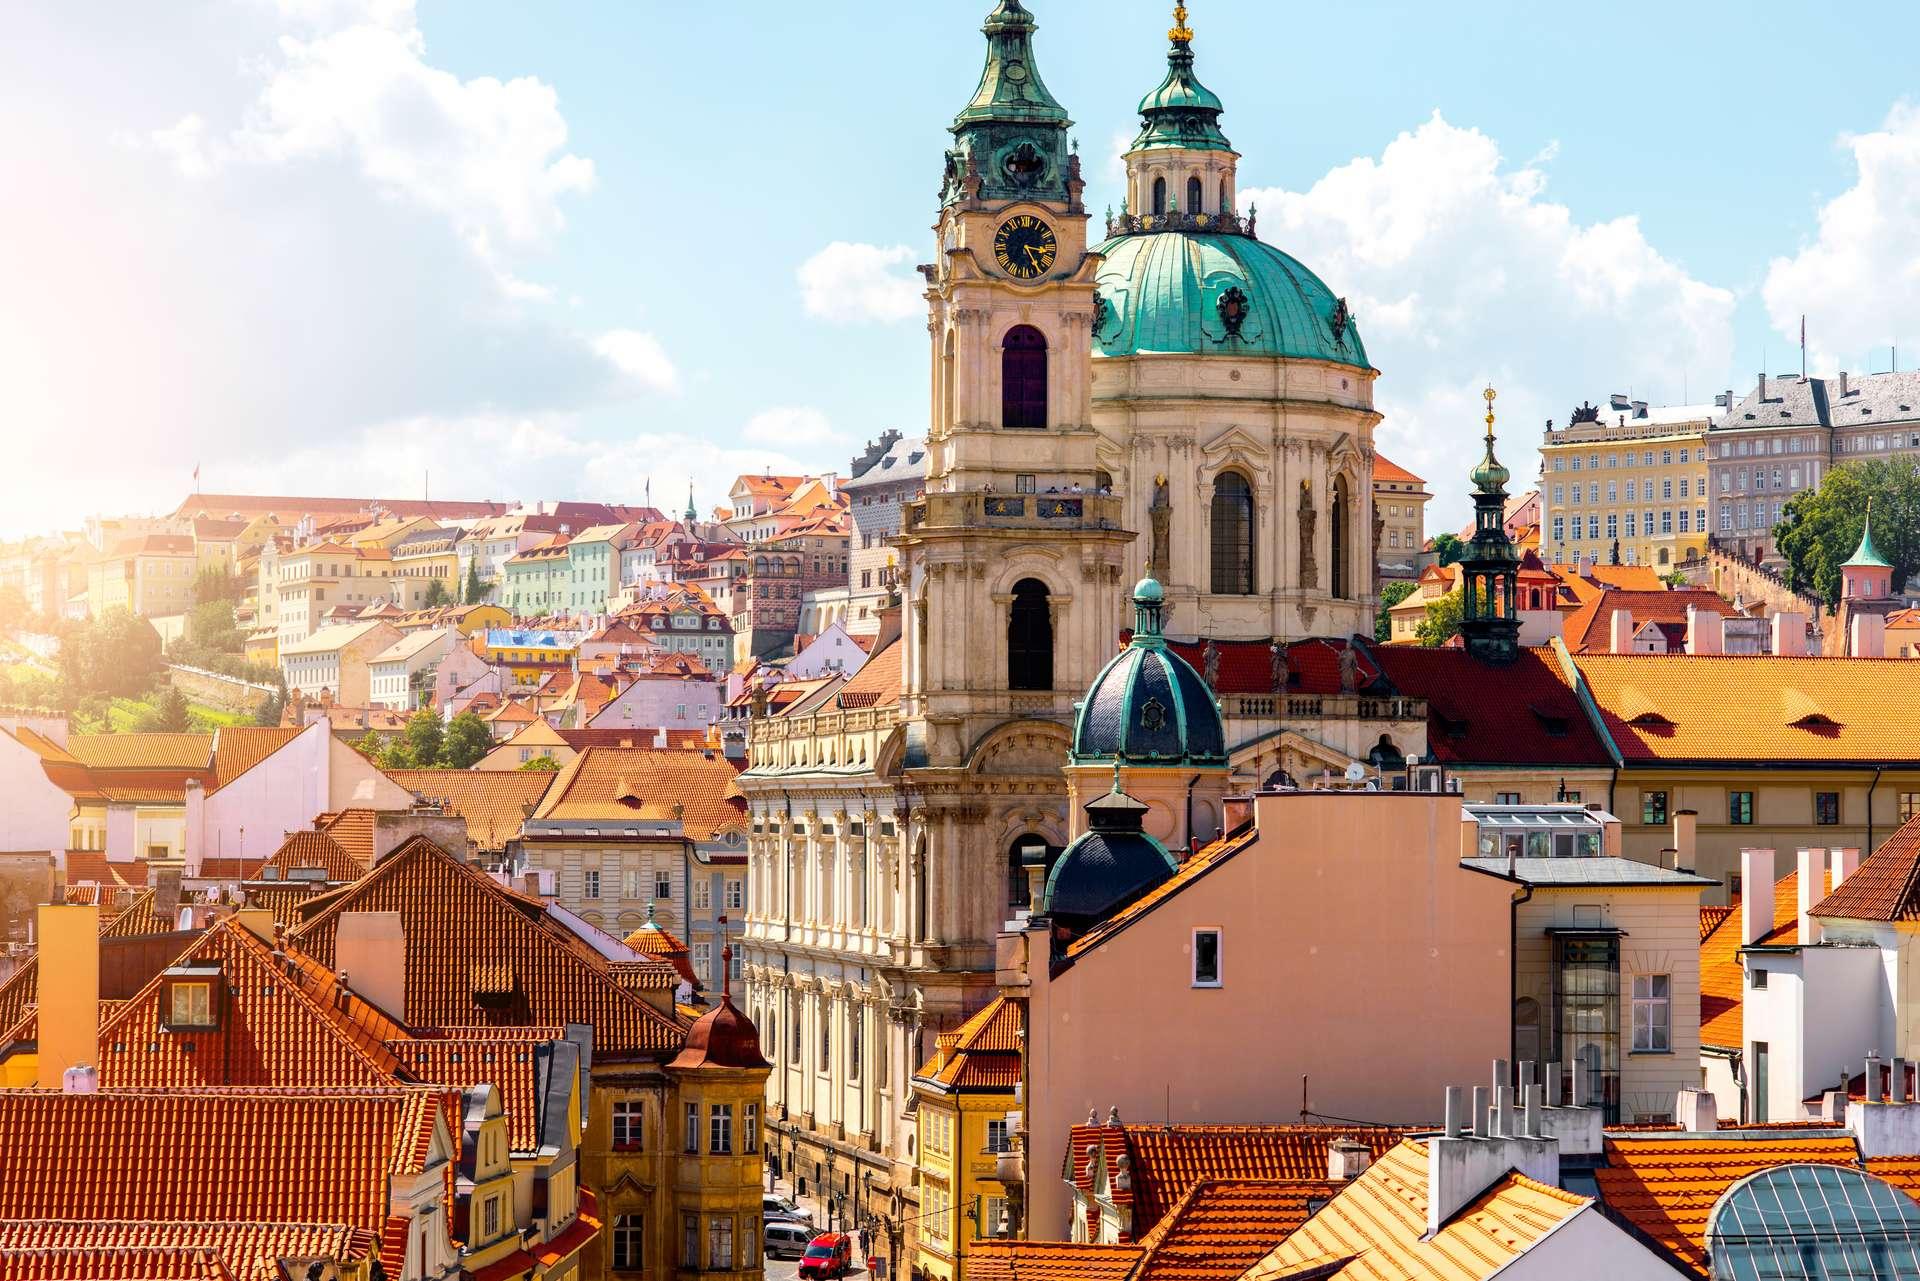 Tsjechië Praag saint Nicholas church